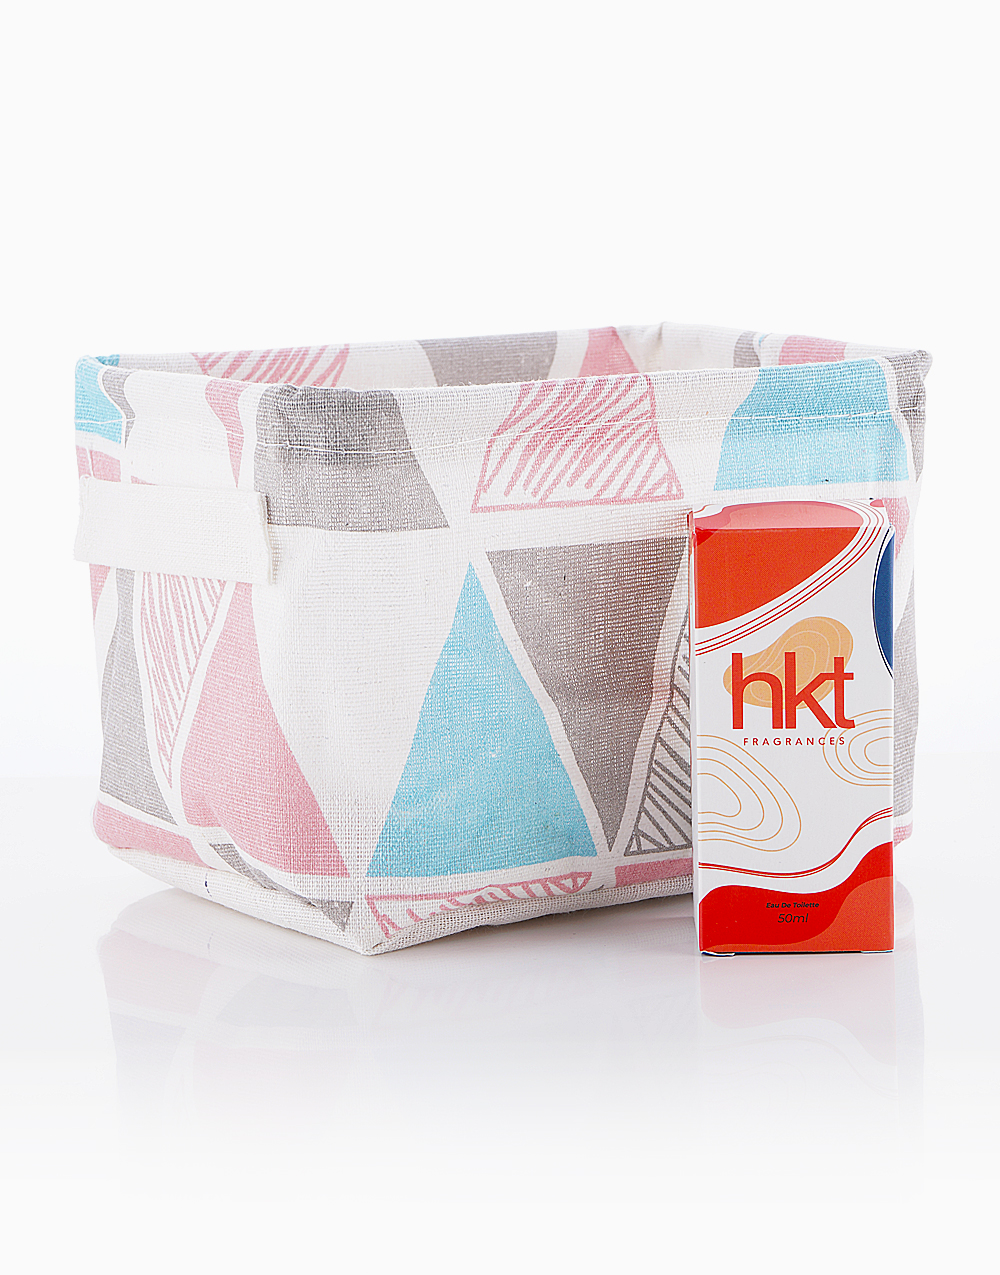 Perfume for Women in Baby Girl + Storage Organizer in Multi Color by HKT Fragrances